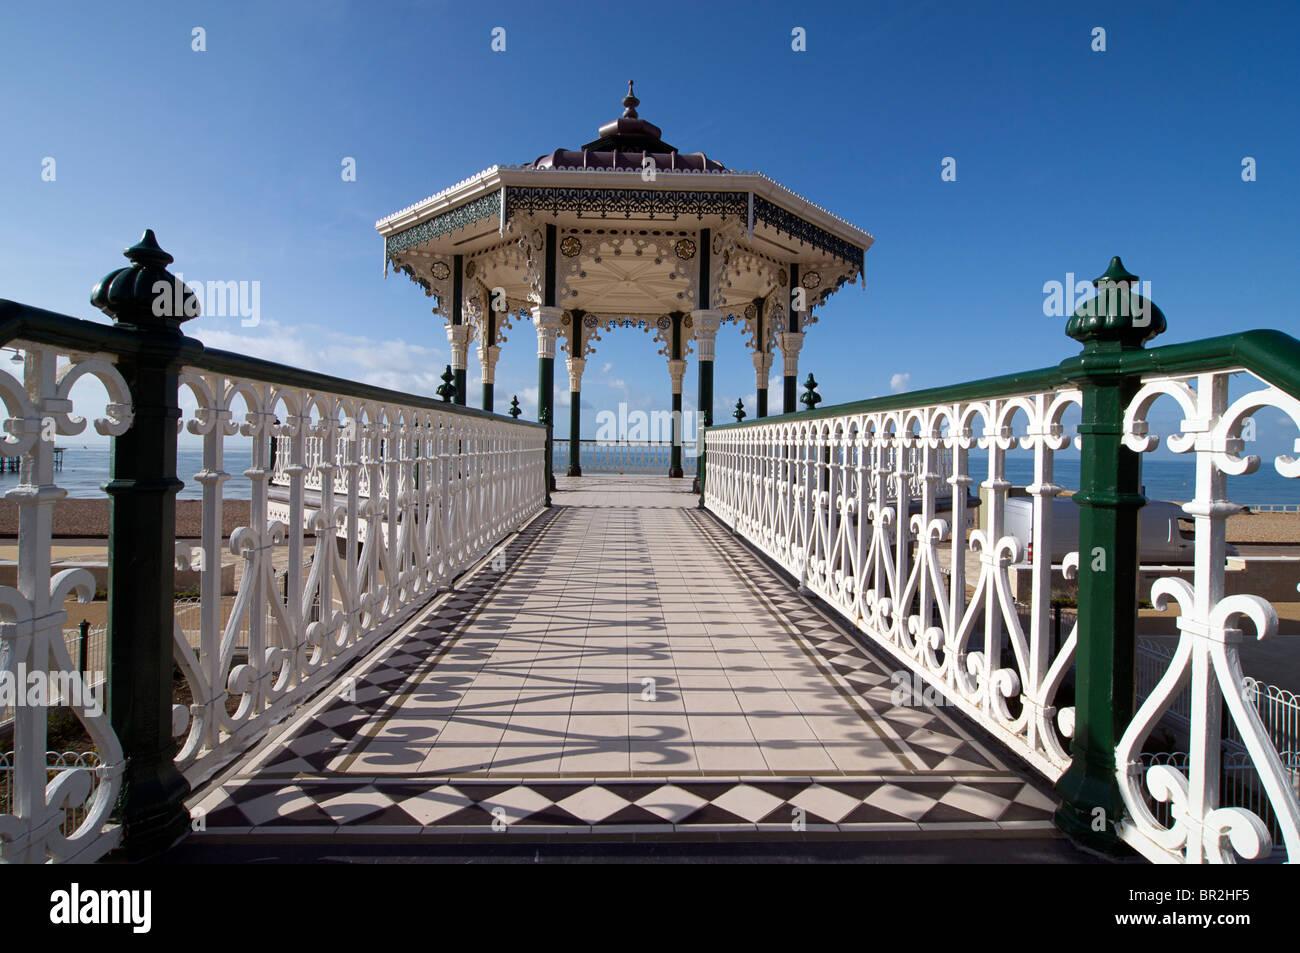 Brighton's restored  bandstand. Brighton, East Sussex, England - Stock Image